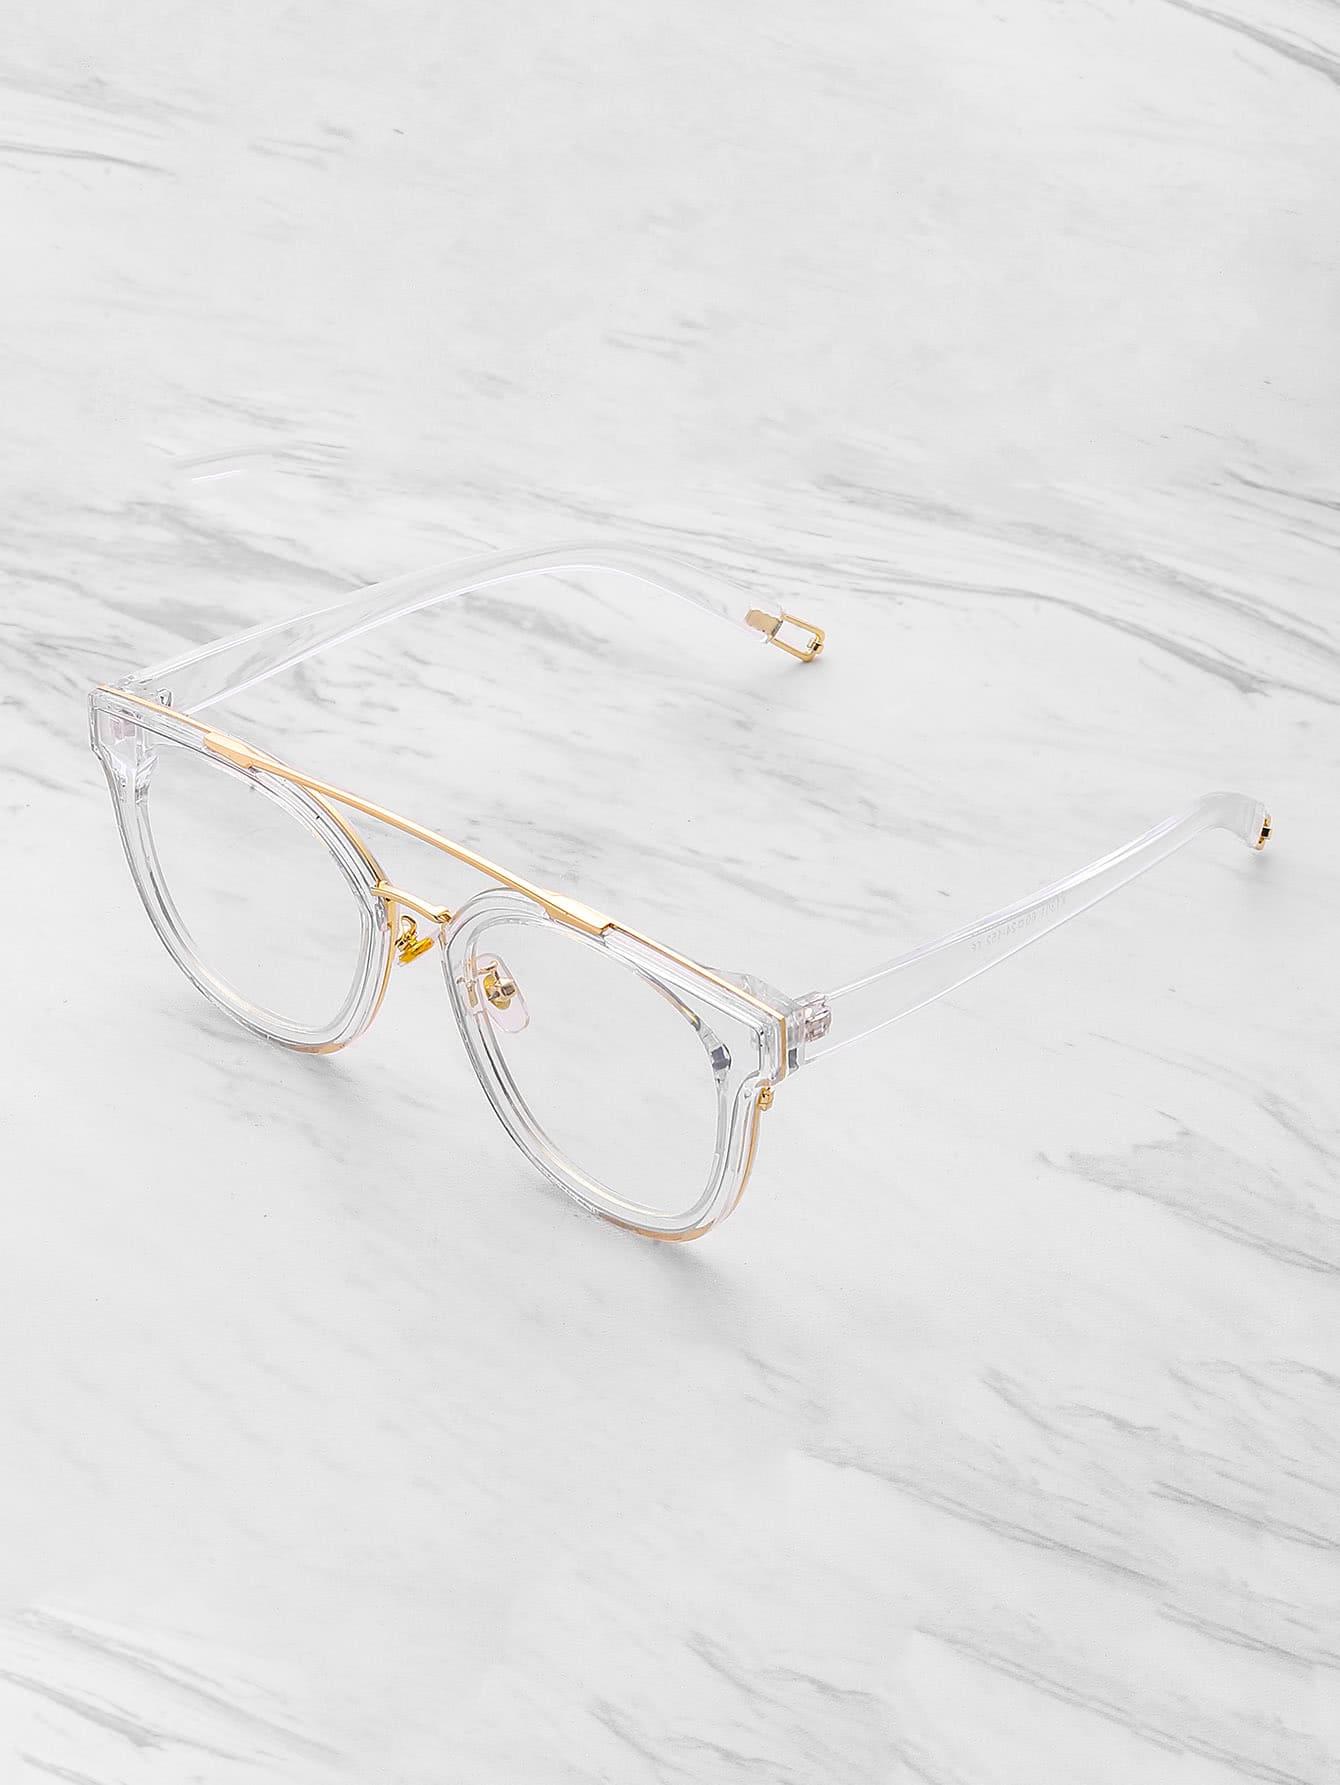 Metal Top Bar Clear Frame Glasses sunglass170602302